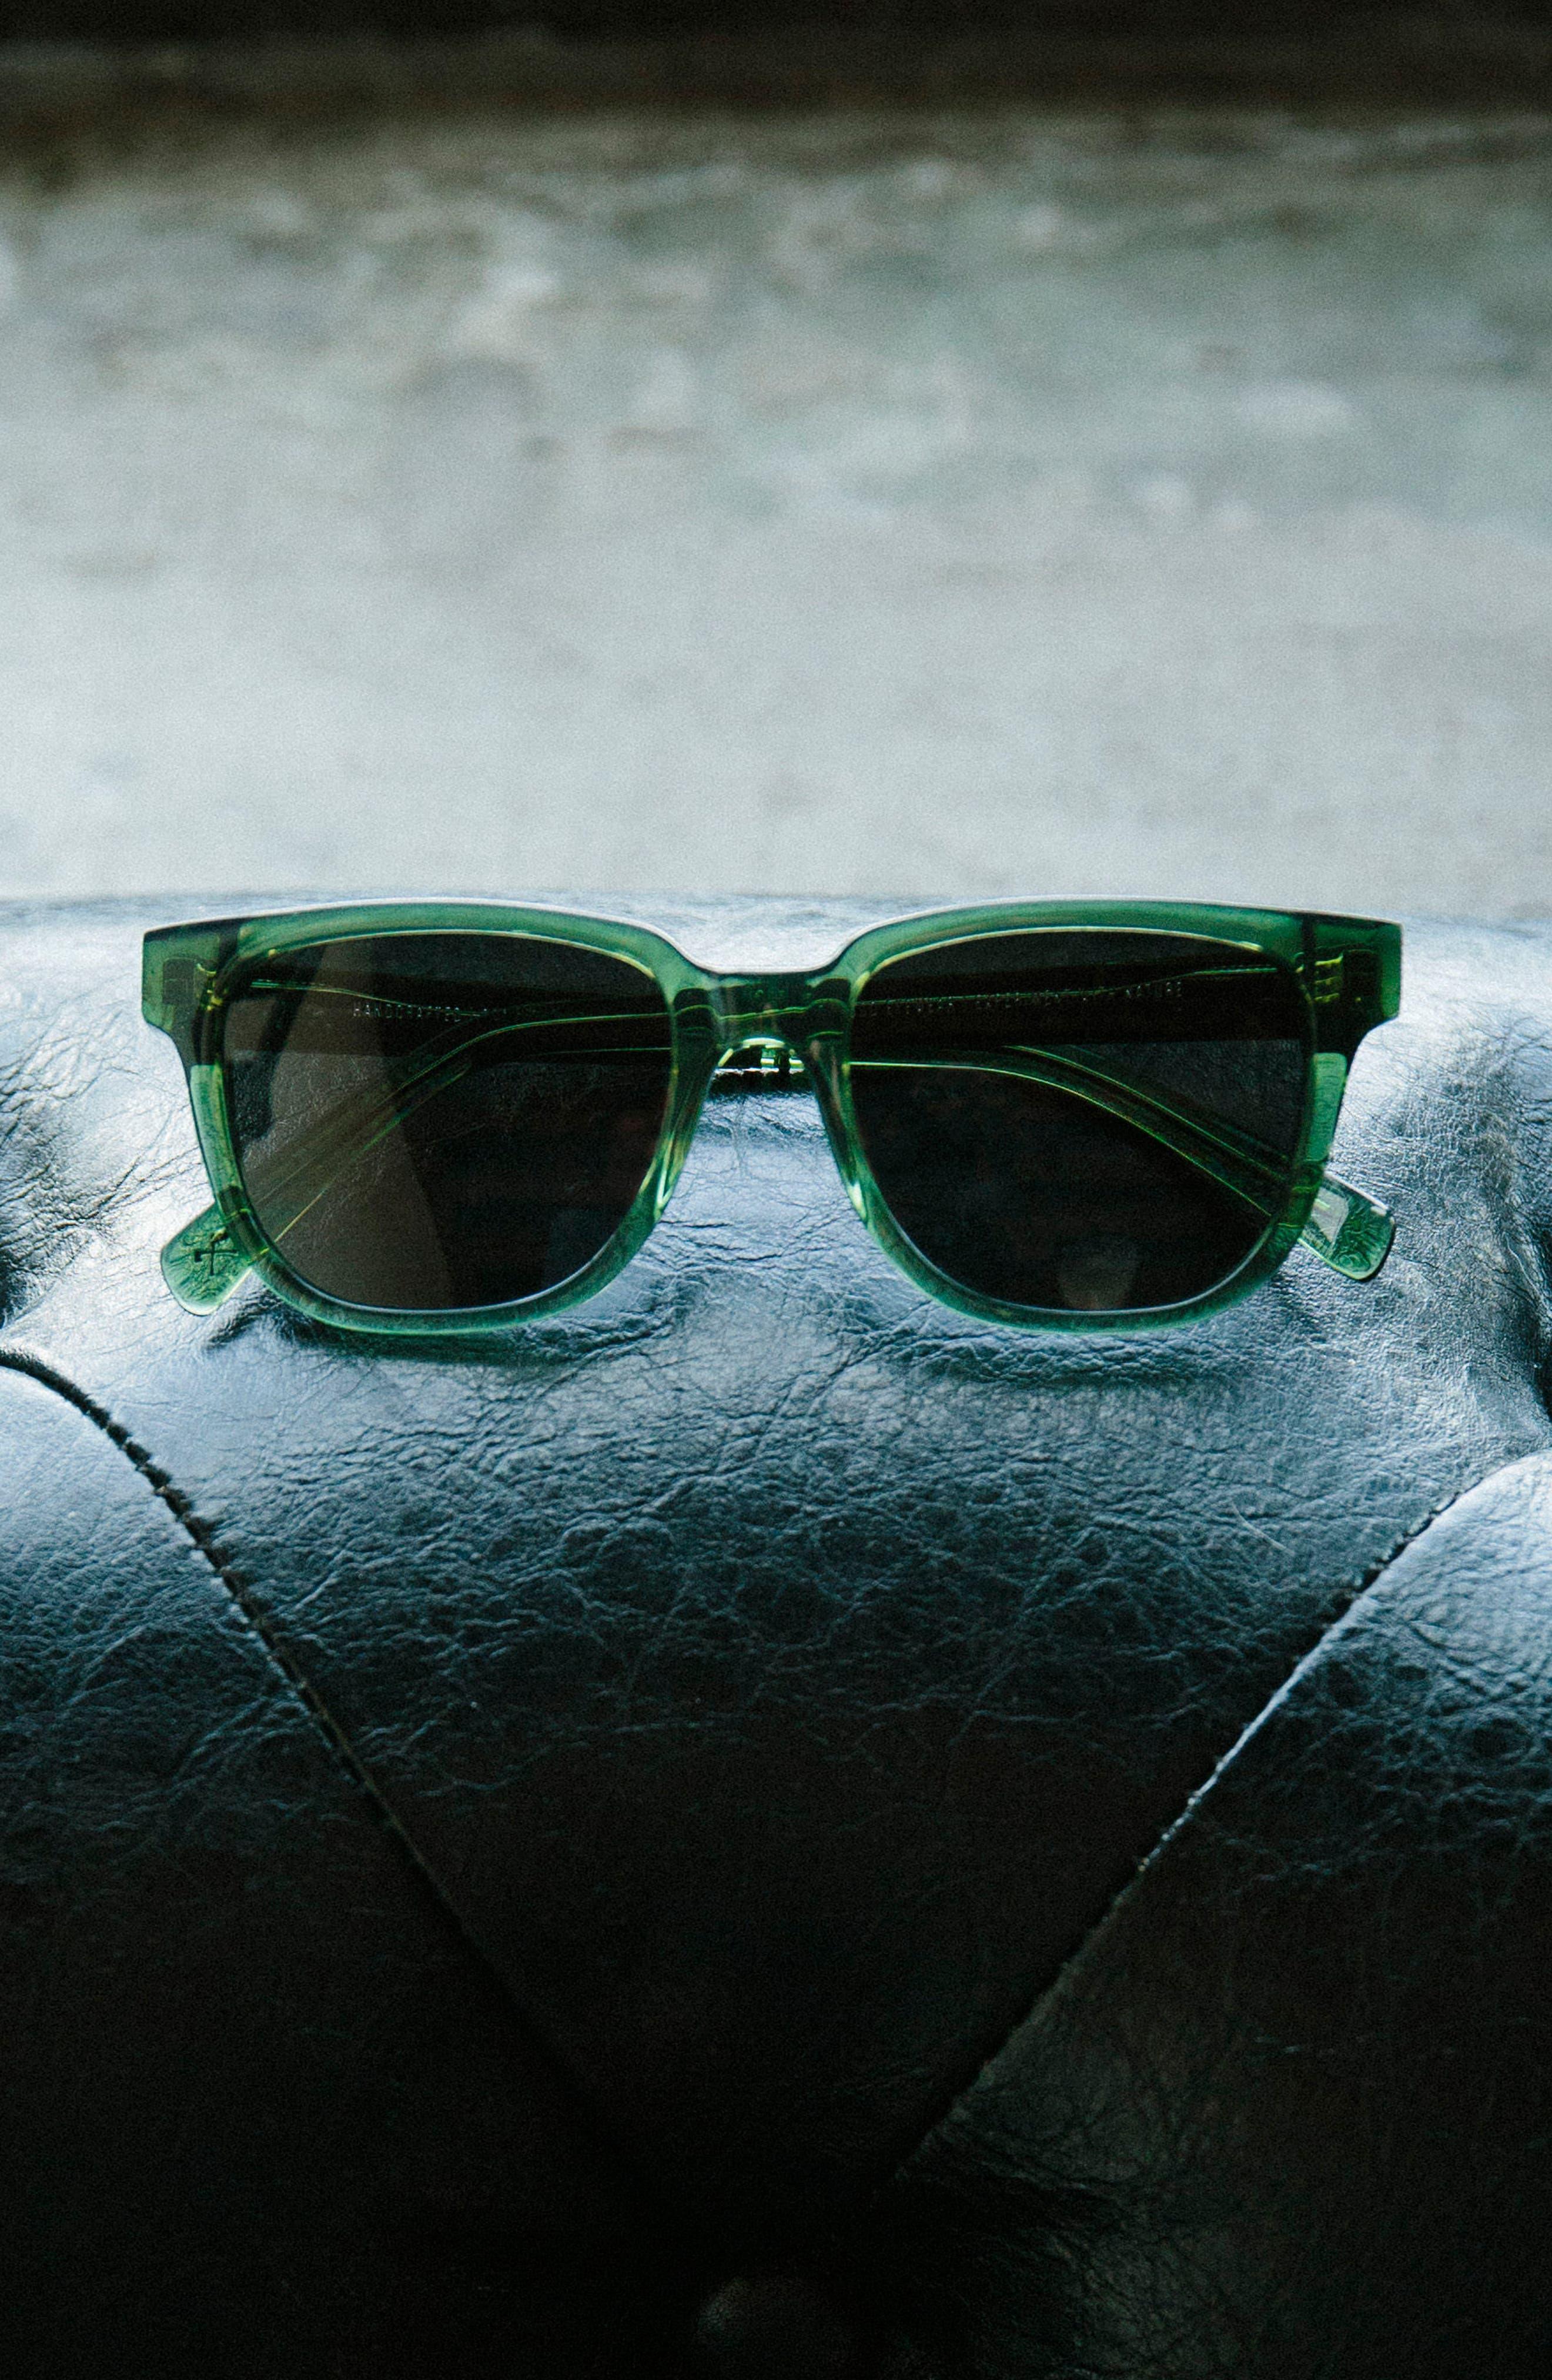 'Prescott' 52mm Acetate & Wood Sunglasses,                             Alternate thumbnail 2, color,                             Emerald/ Elm Burl/ Grey